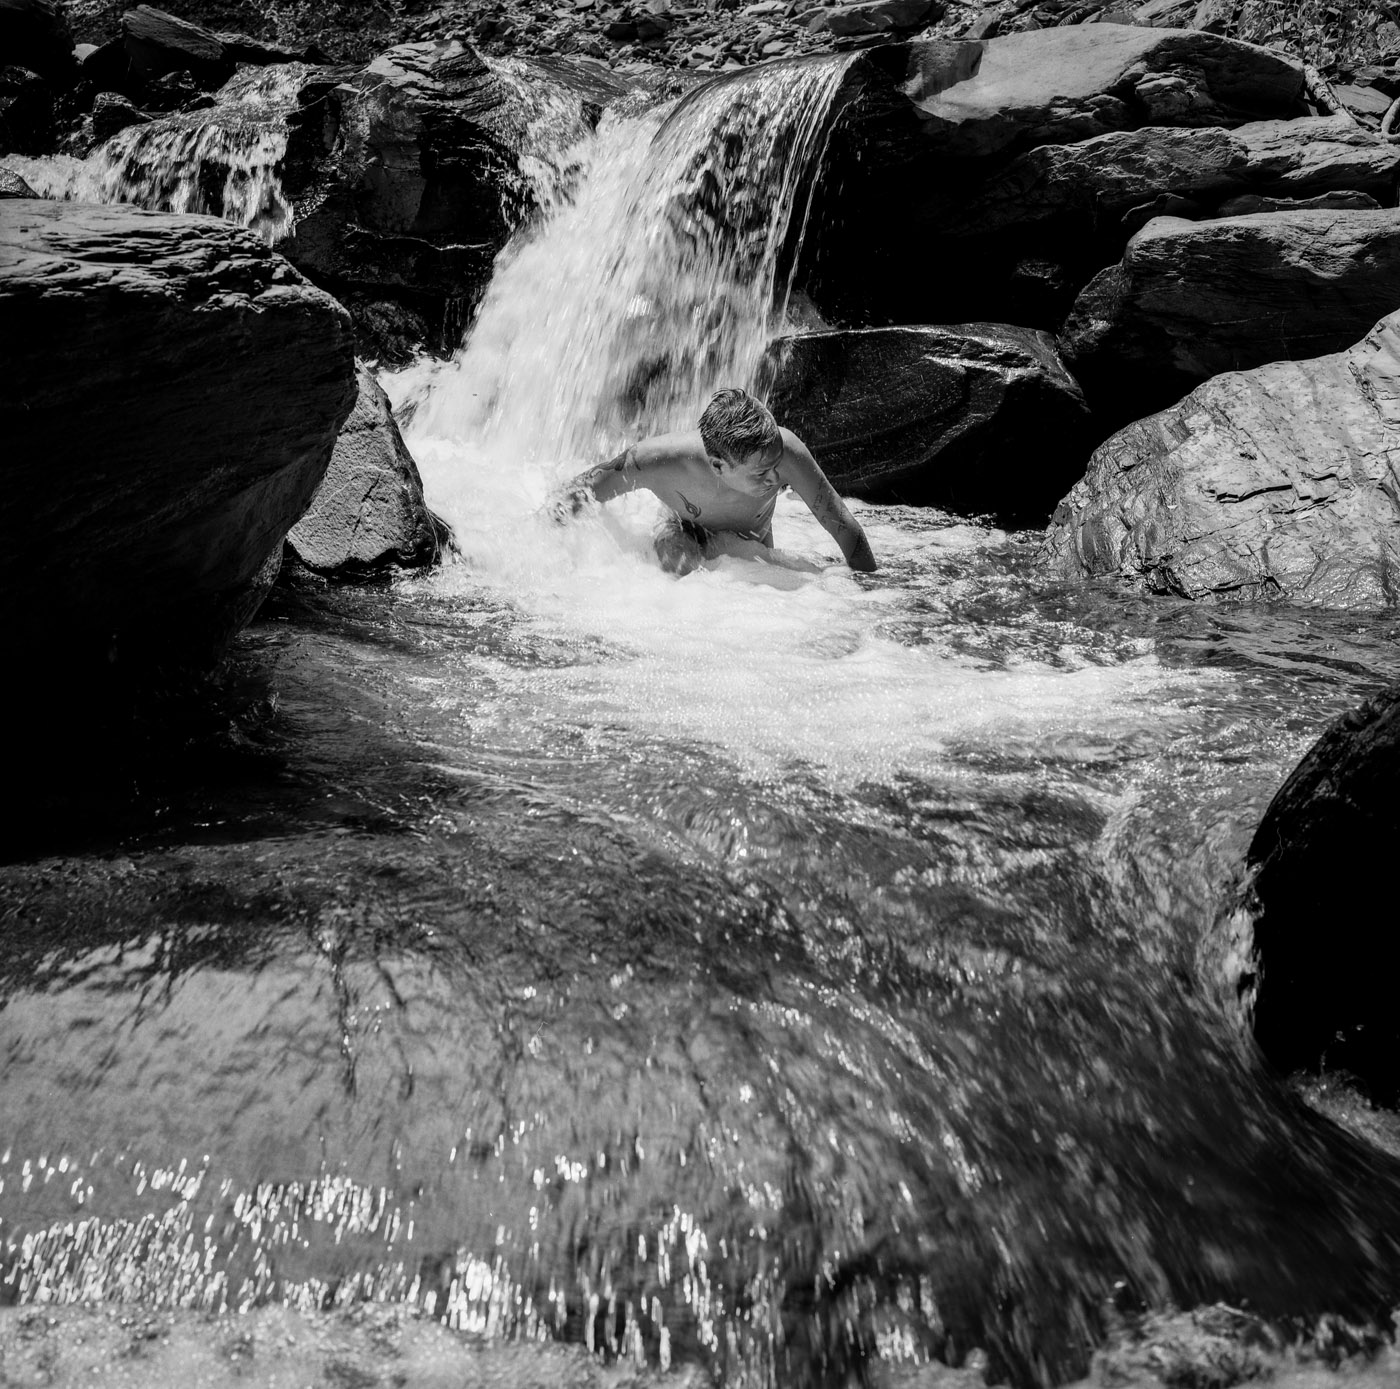 Hsuan_Chung_Formosa_Aborigines_07.JPG